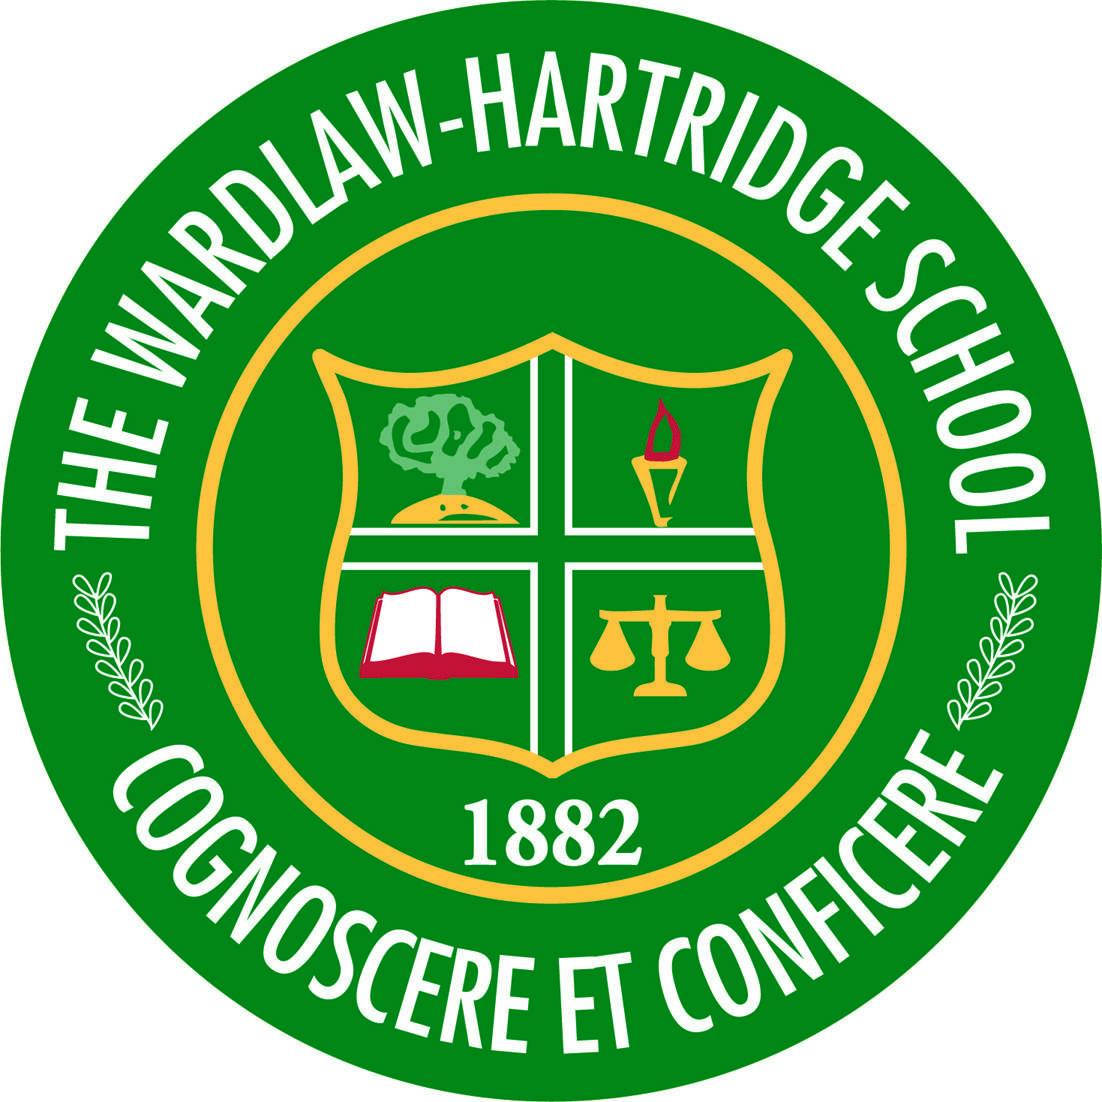 8e525abe2d14a8a3d16f_Wardlaw_Hartridge_logo.jpg